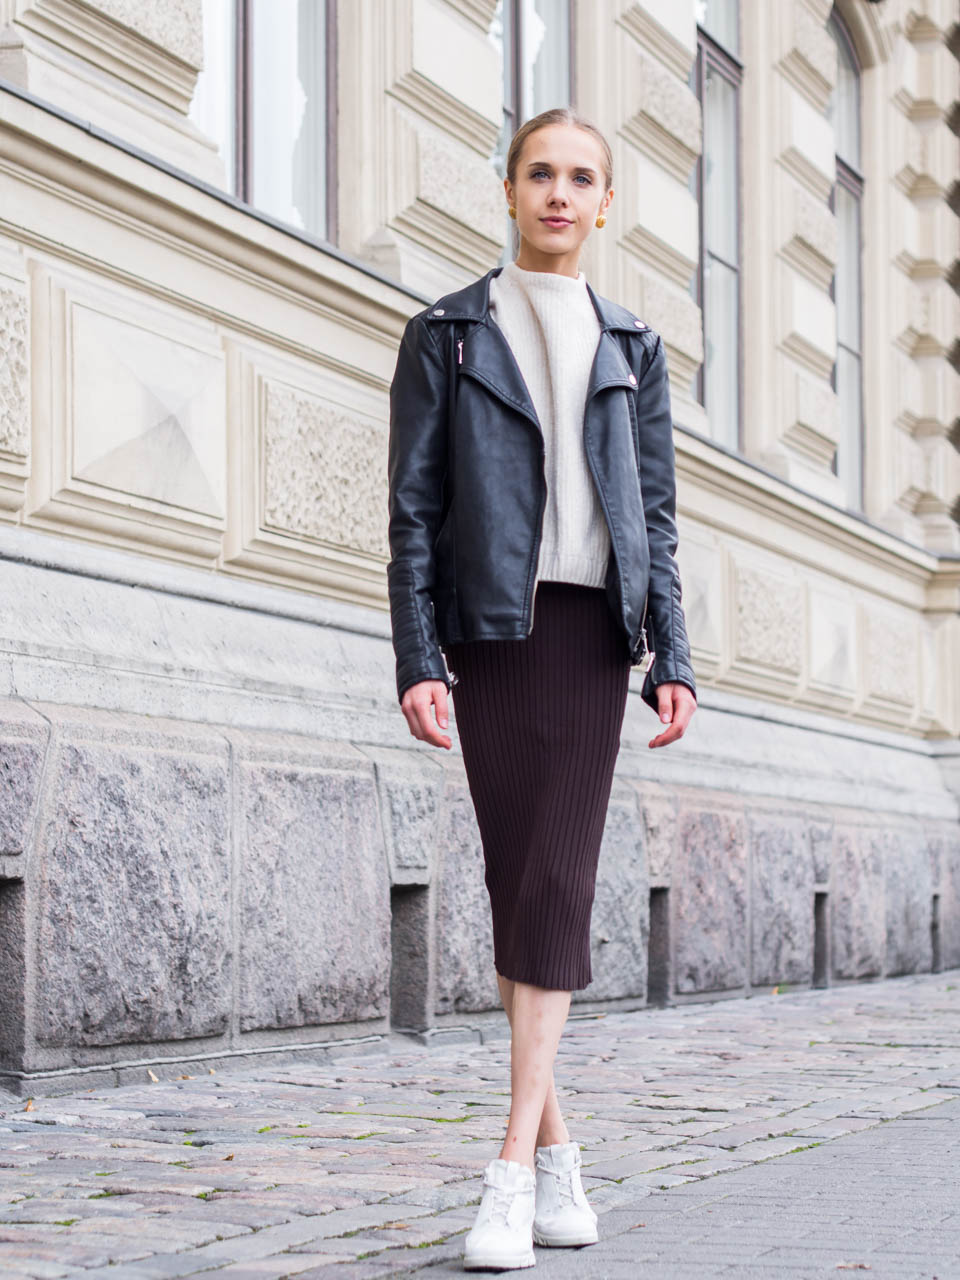 jumper-and-skirt-outfit-fashion-blogger-scandinavia-streetstyle-villapaita-neule-hame-syysasu-muotibloggaaja